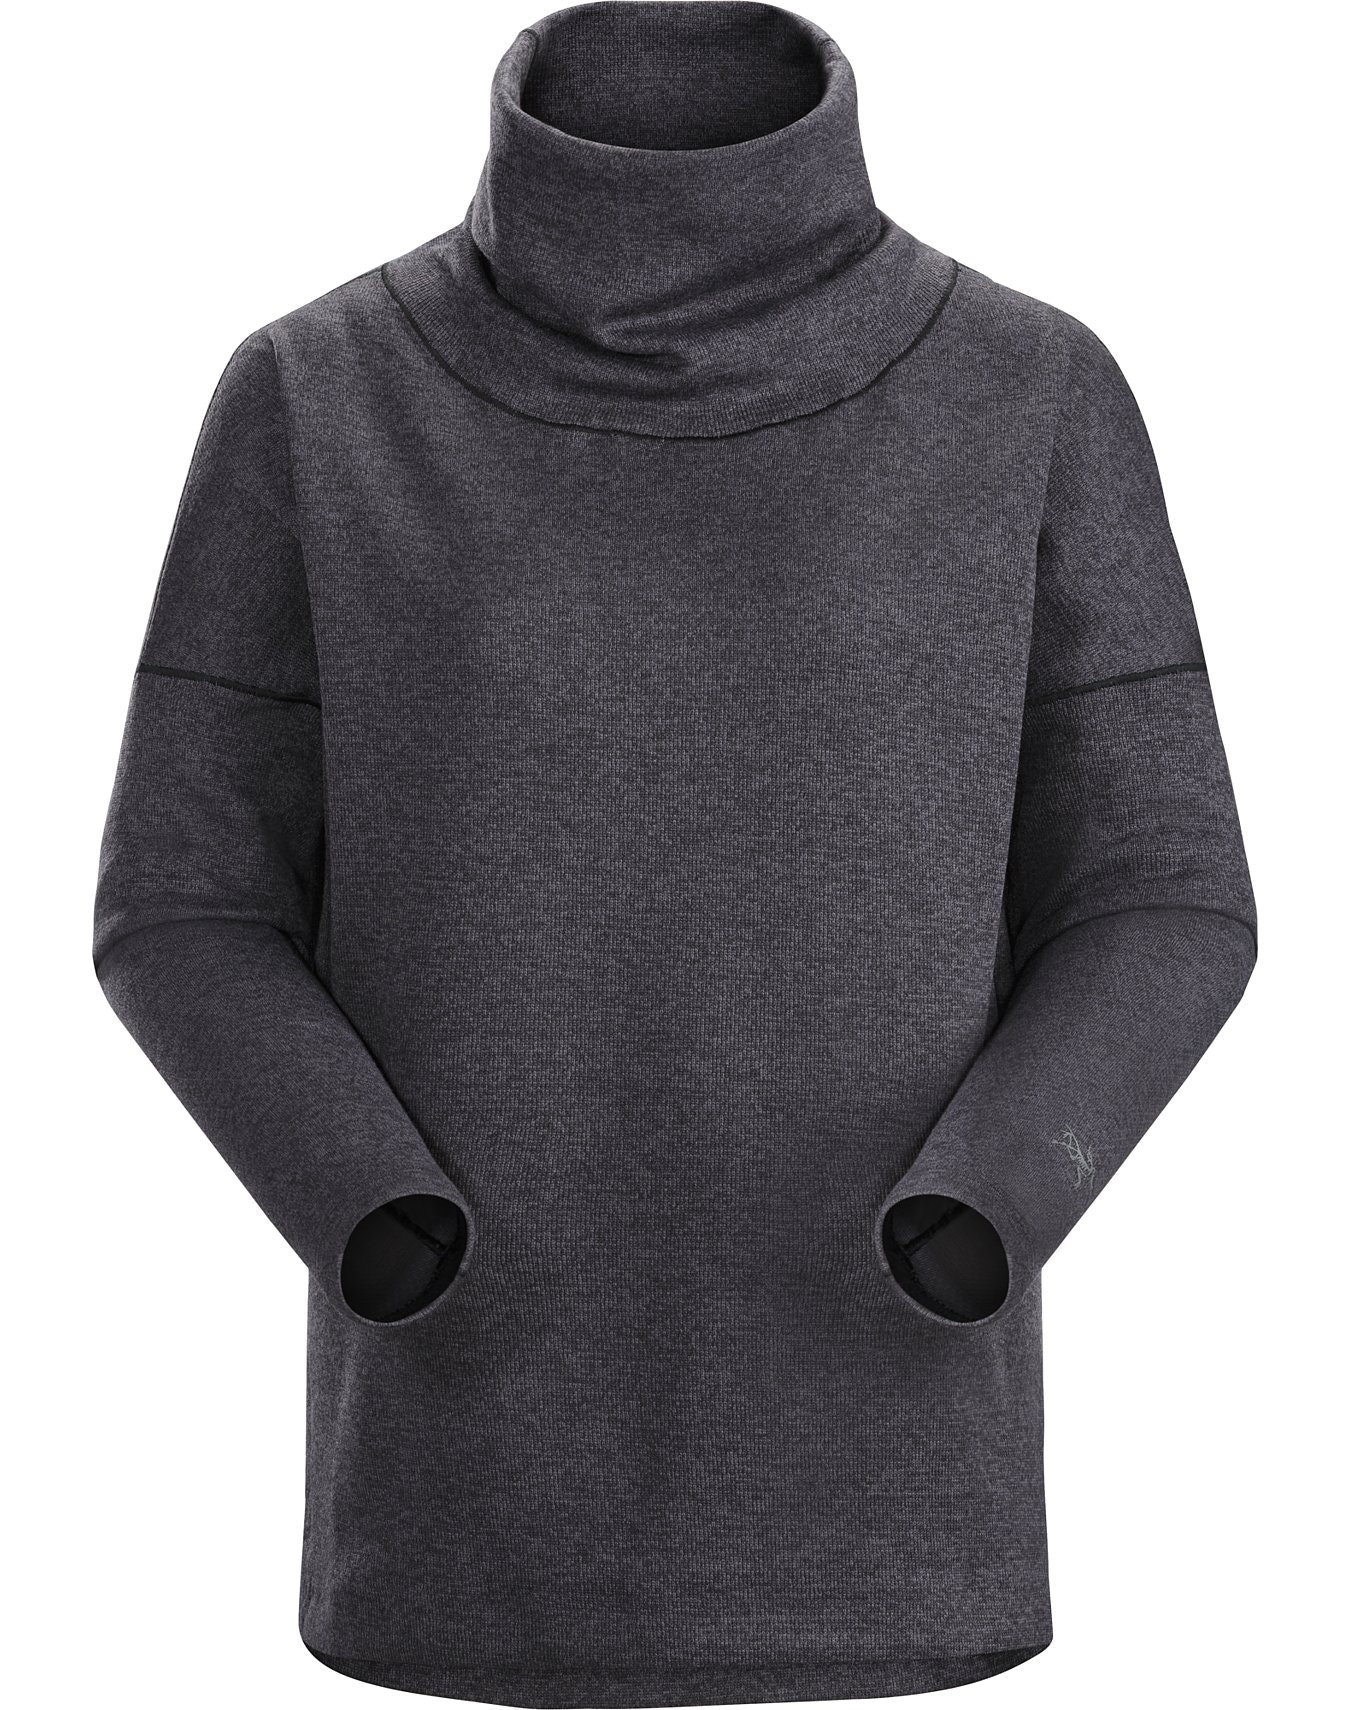 ARCTERYX Arc'teryx Laina Sweater